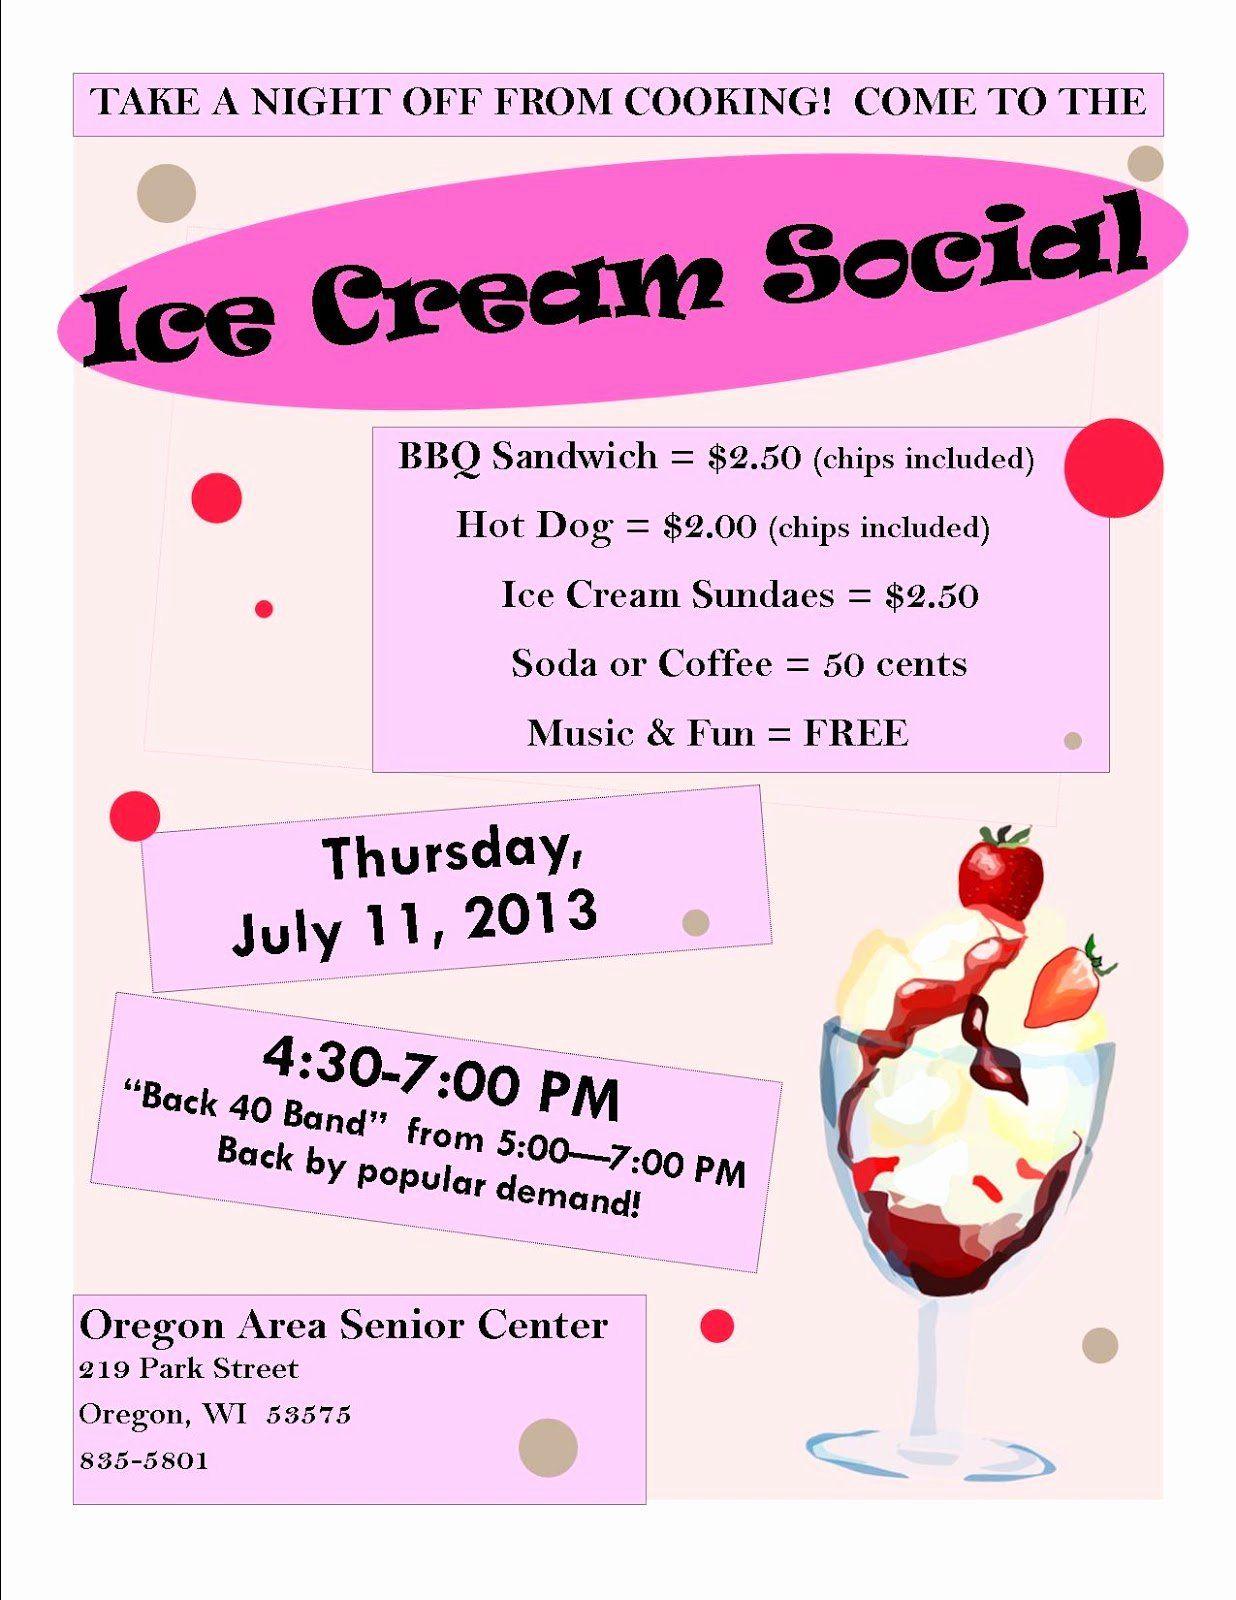 Ice Cream Social Flyer Beautiful Oregon Area Senior Center Council On Aging 07 01 2013 08 01 2013 Flyer Template Flyer Ice Cream Social